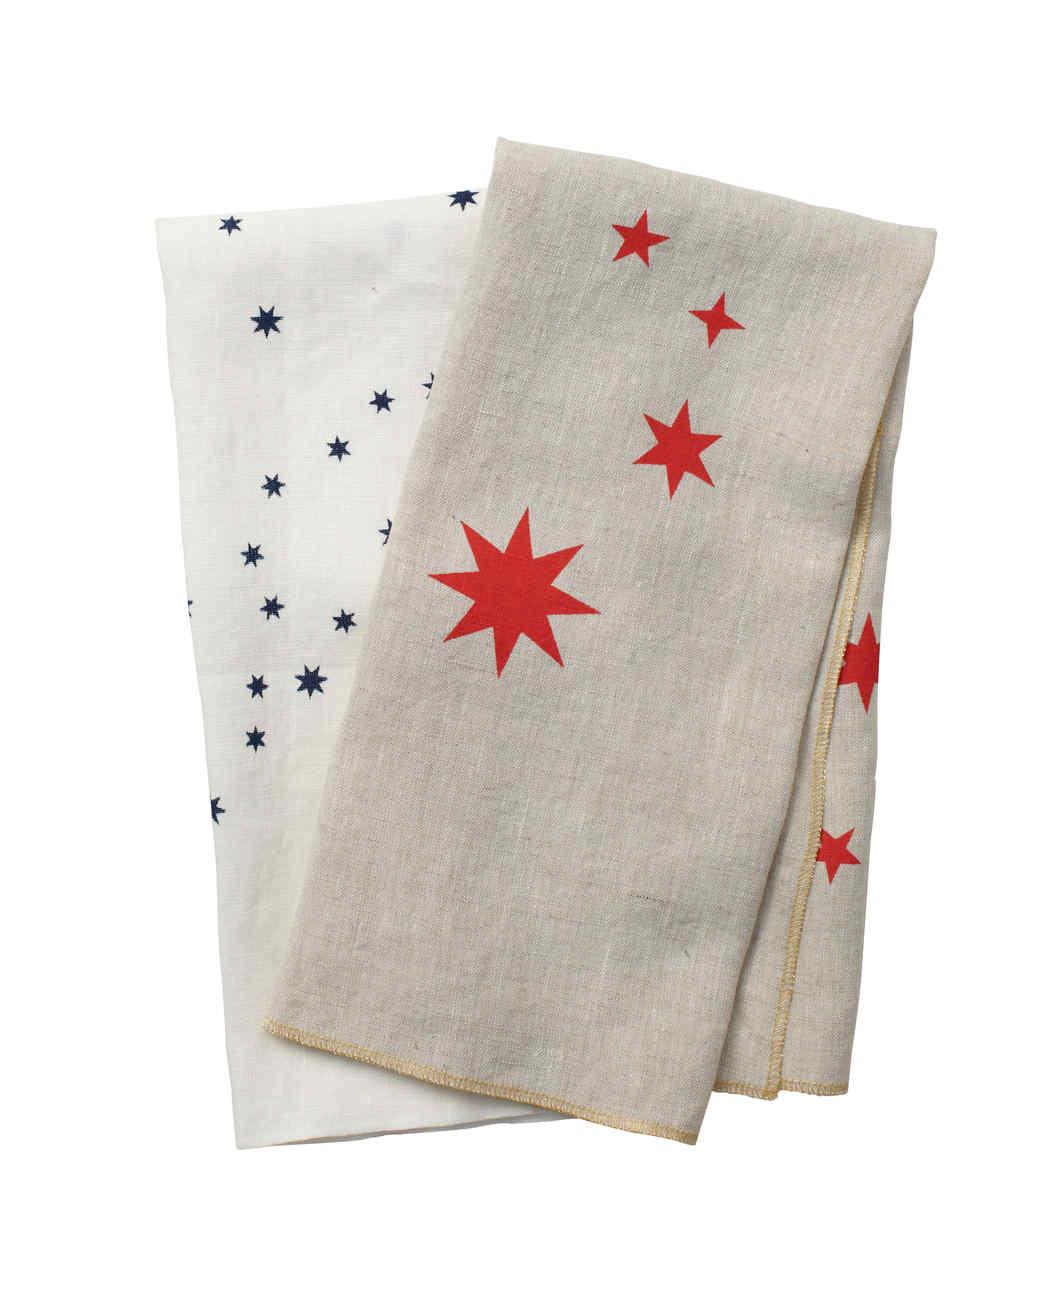 tea-towels-074-ld110642.jpg